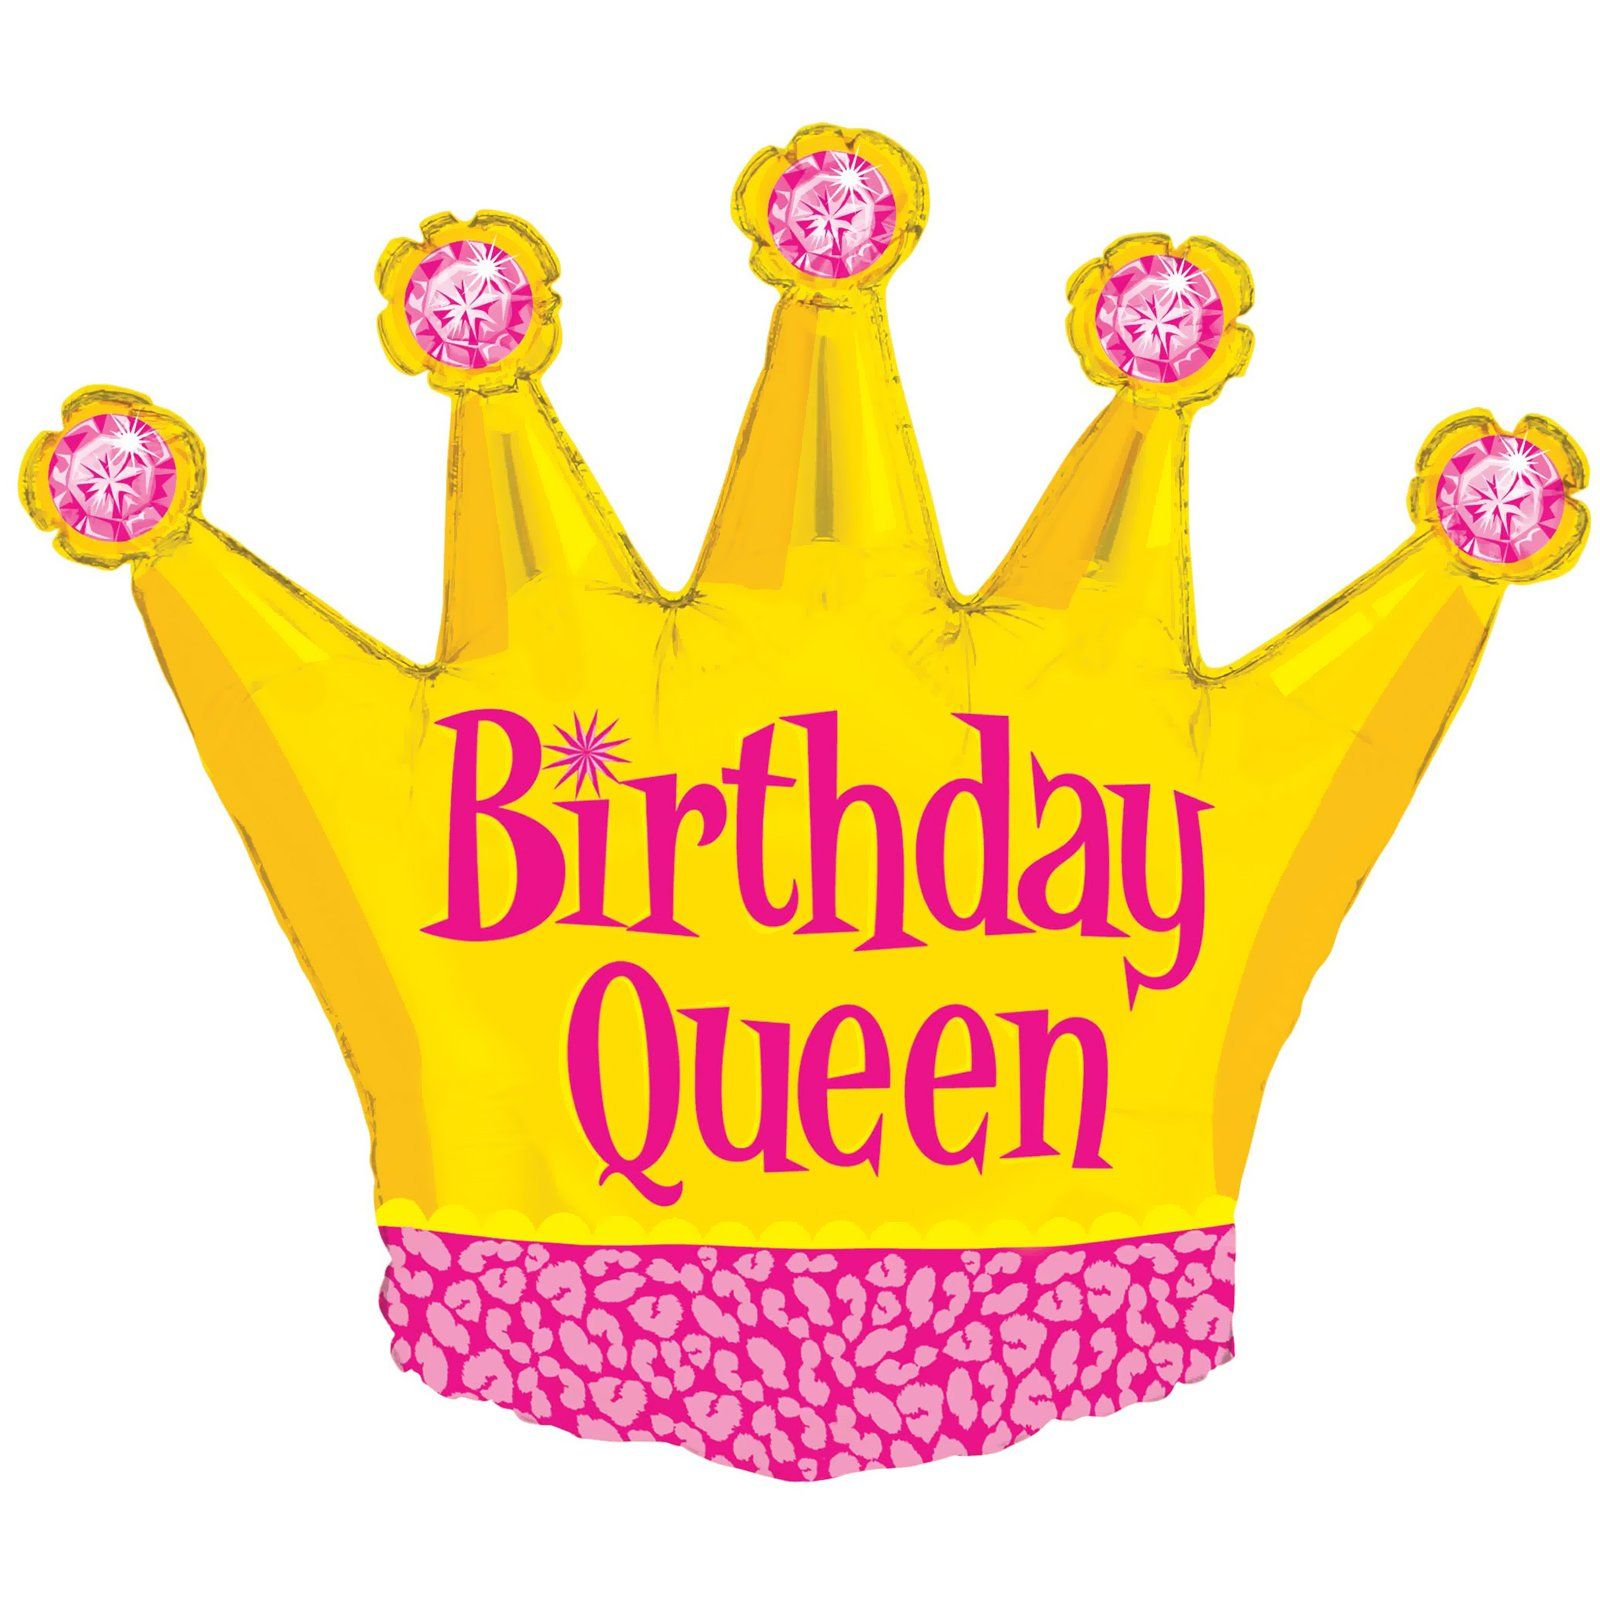 Birthday queen happy wishes pinterest